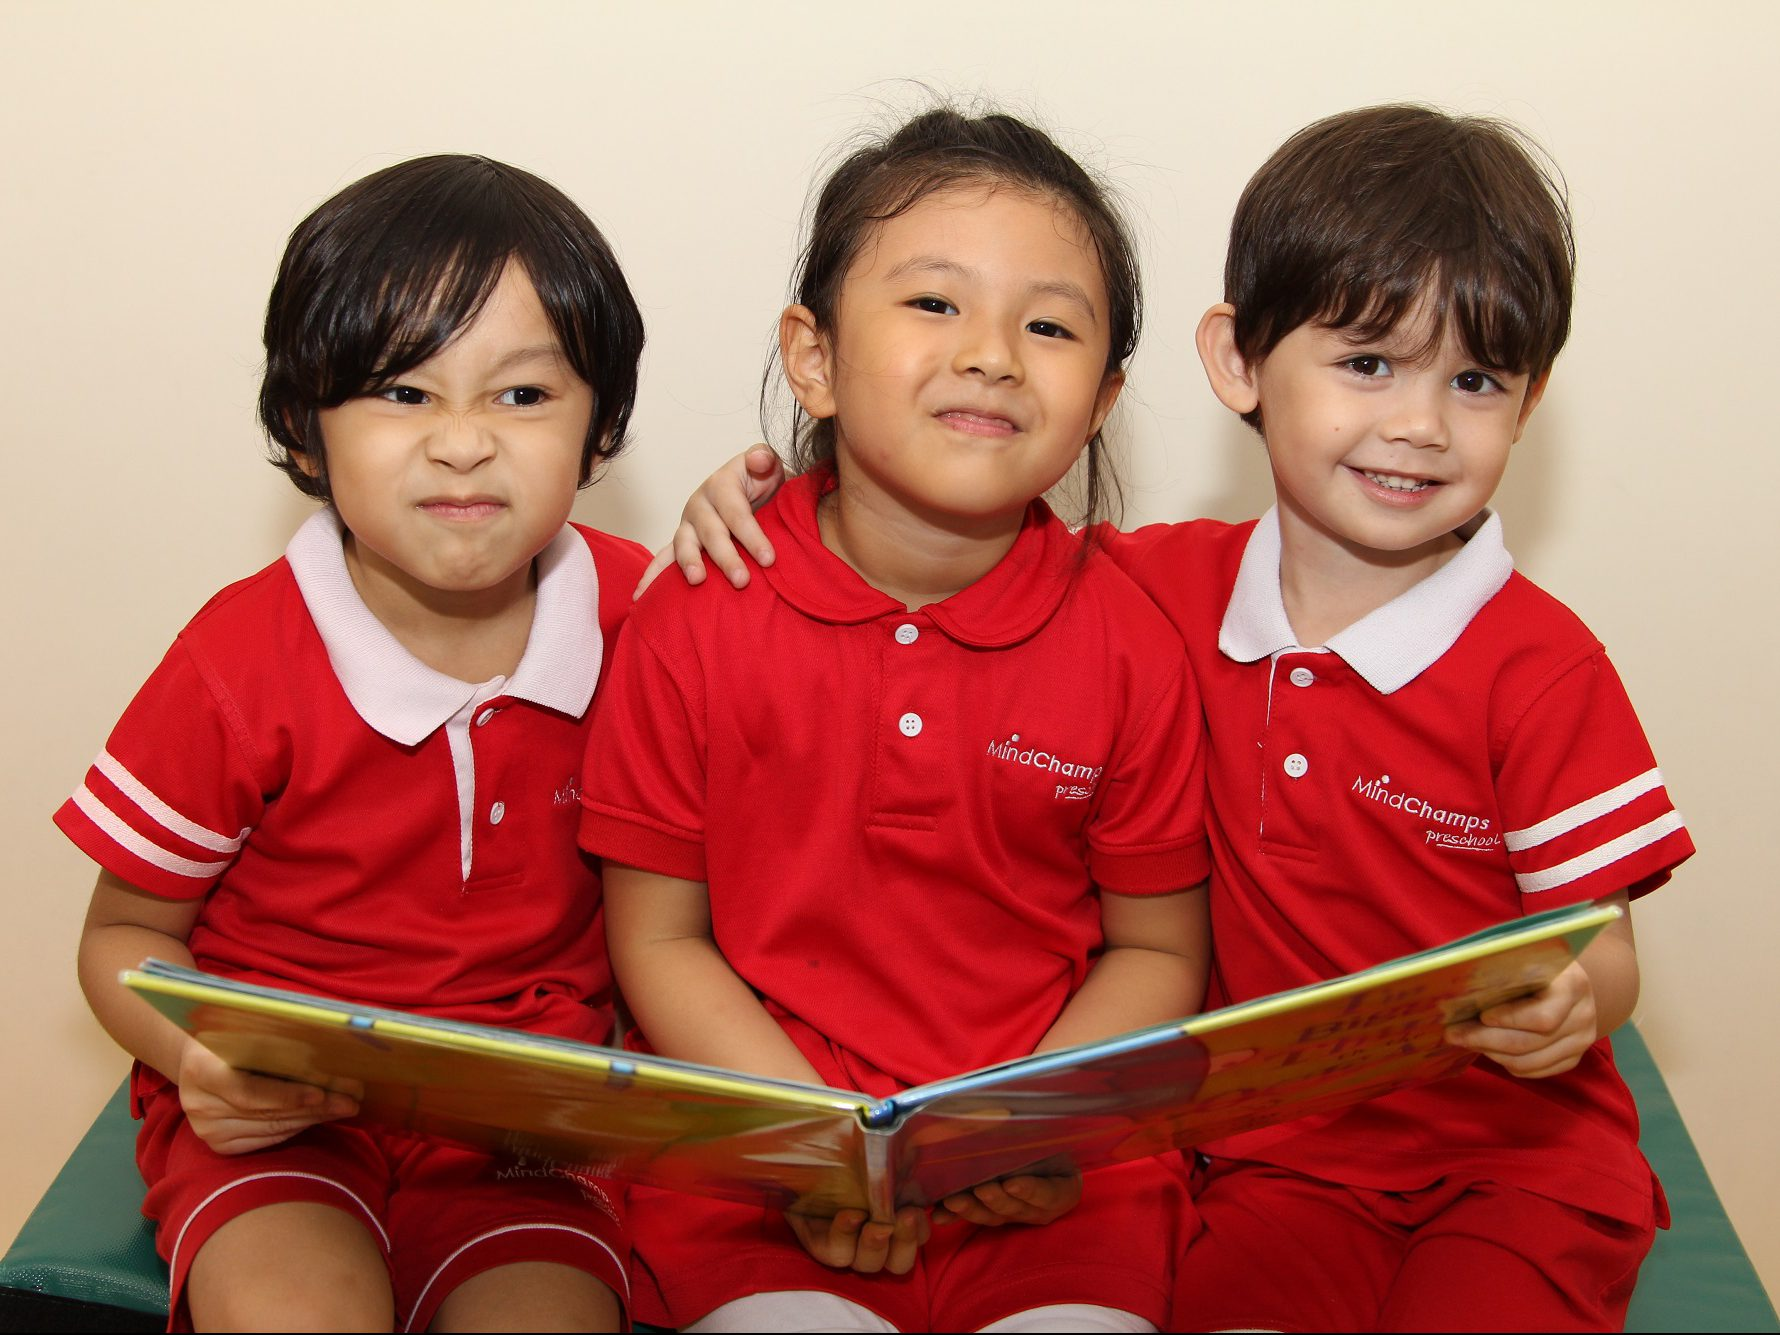 macpherson childcare